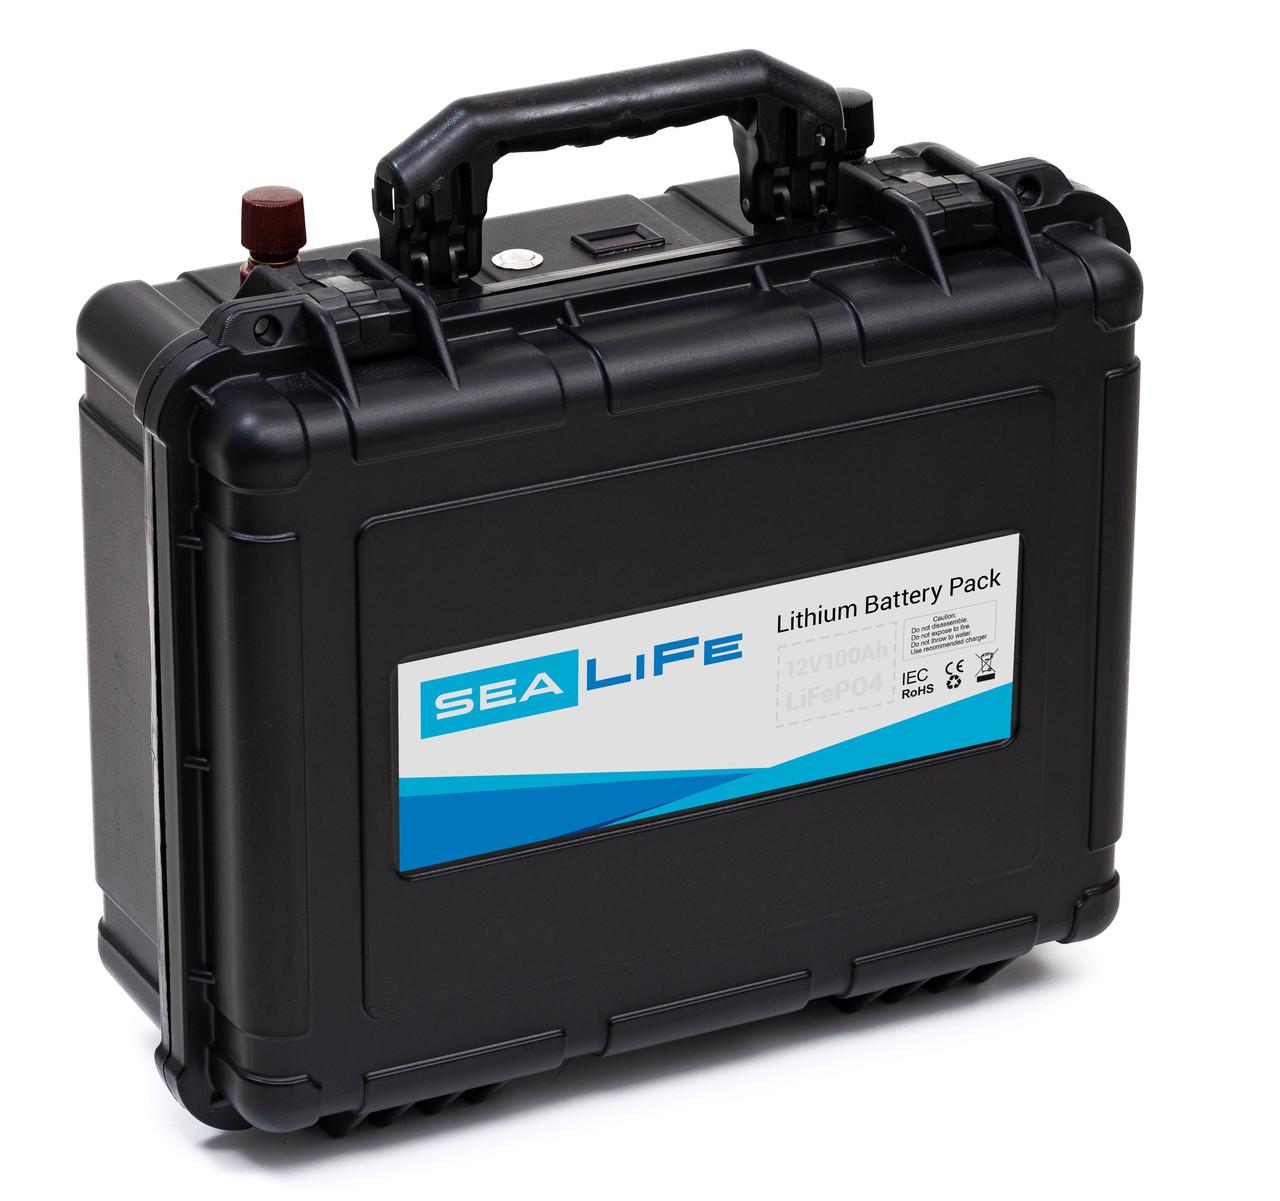 Літієвий акумулятор 12В LiFePO4 80Ач Challenger Sealife 12-80